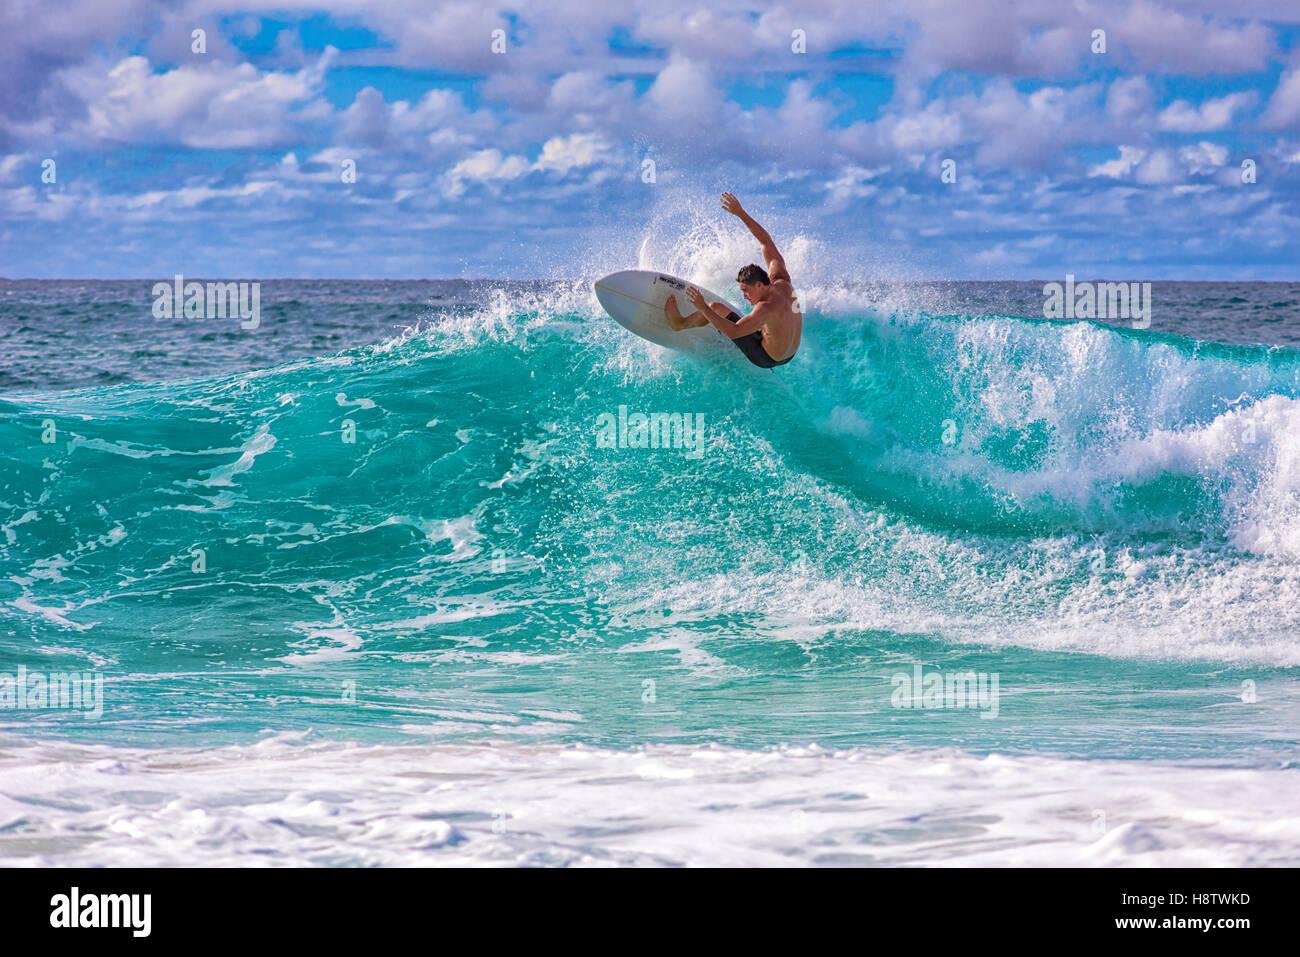 9fe8fcc7d0 Surfer at Banzai Pipeline